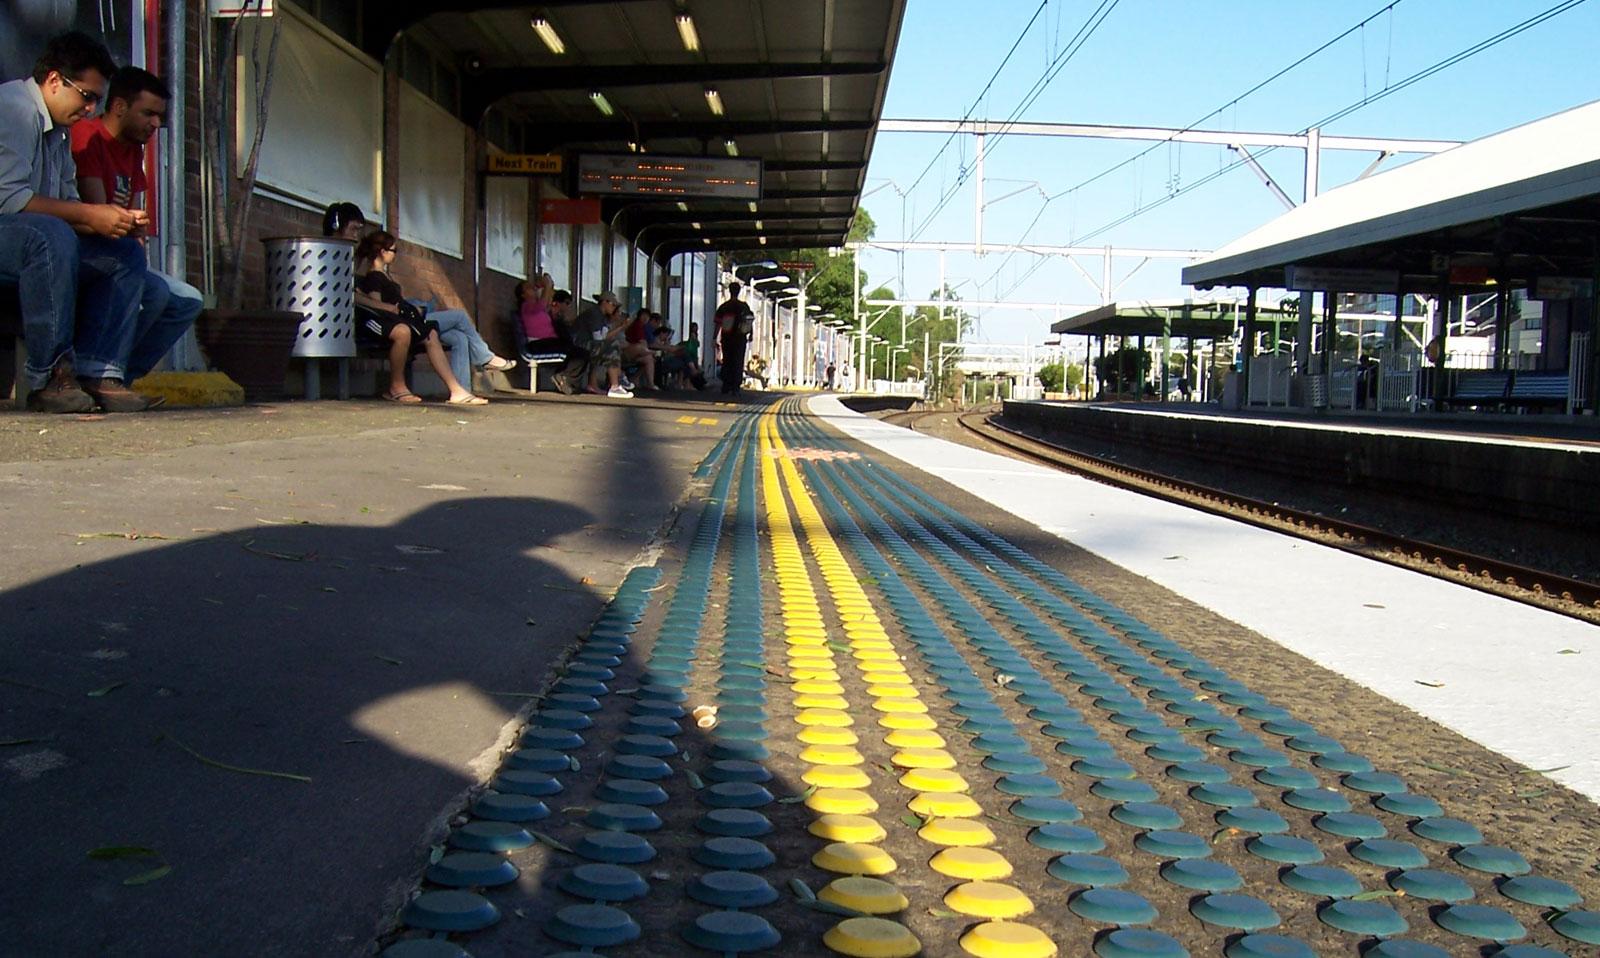 File:Burwood station platform.jpg - Wikimedia Commons